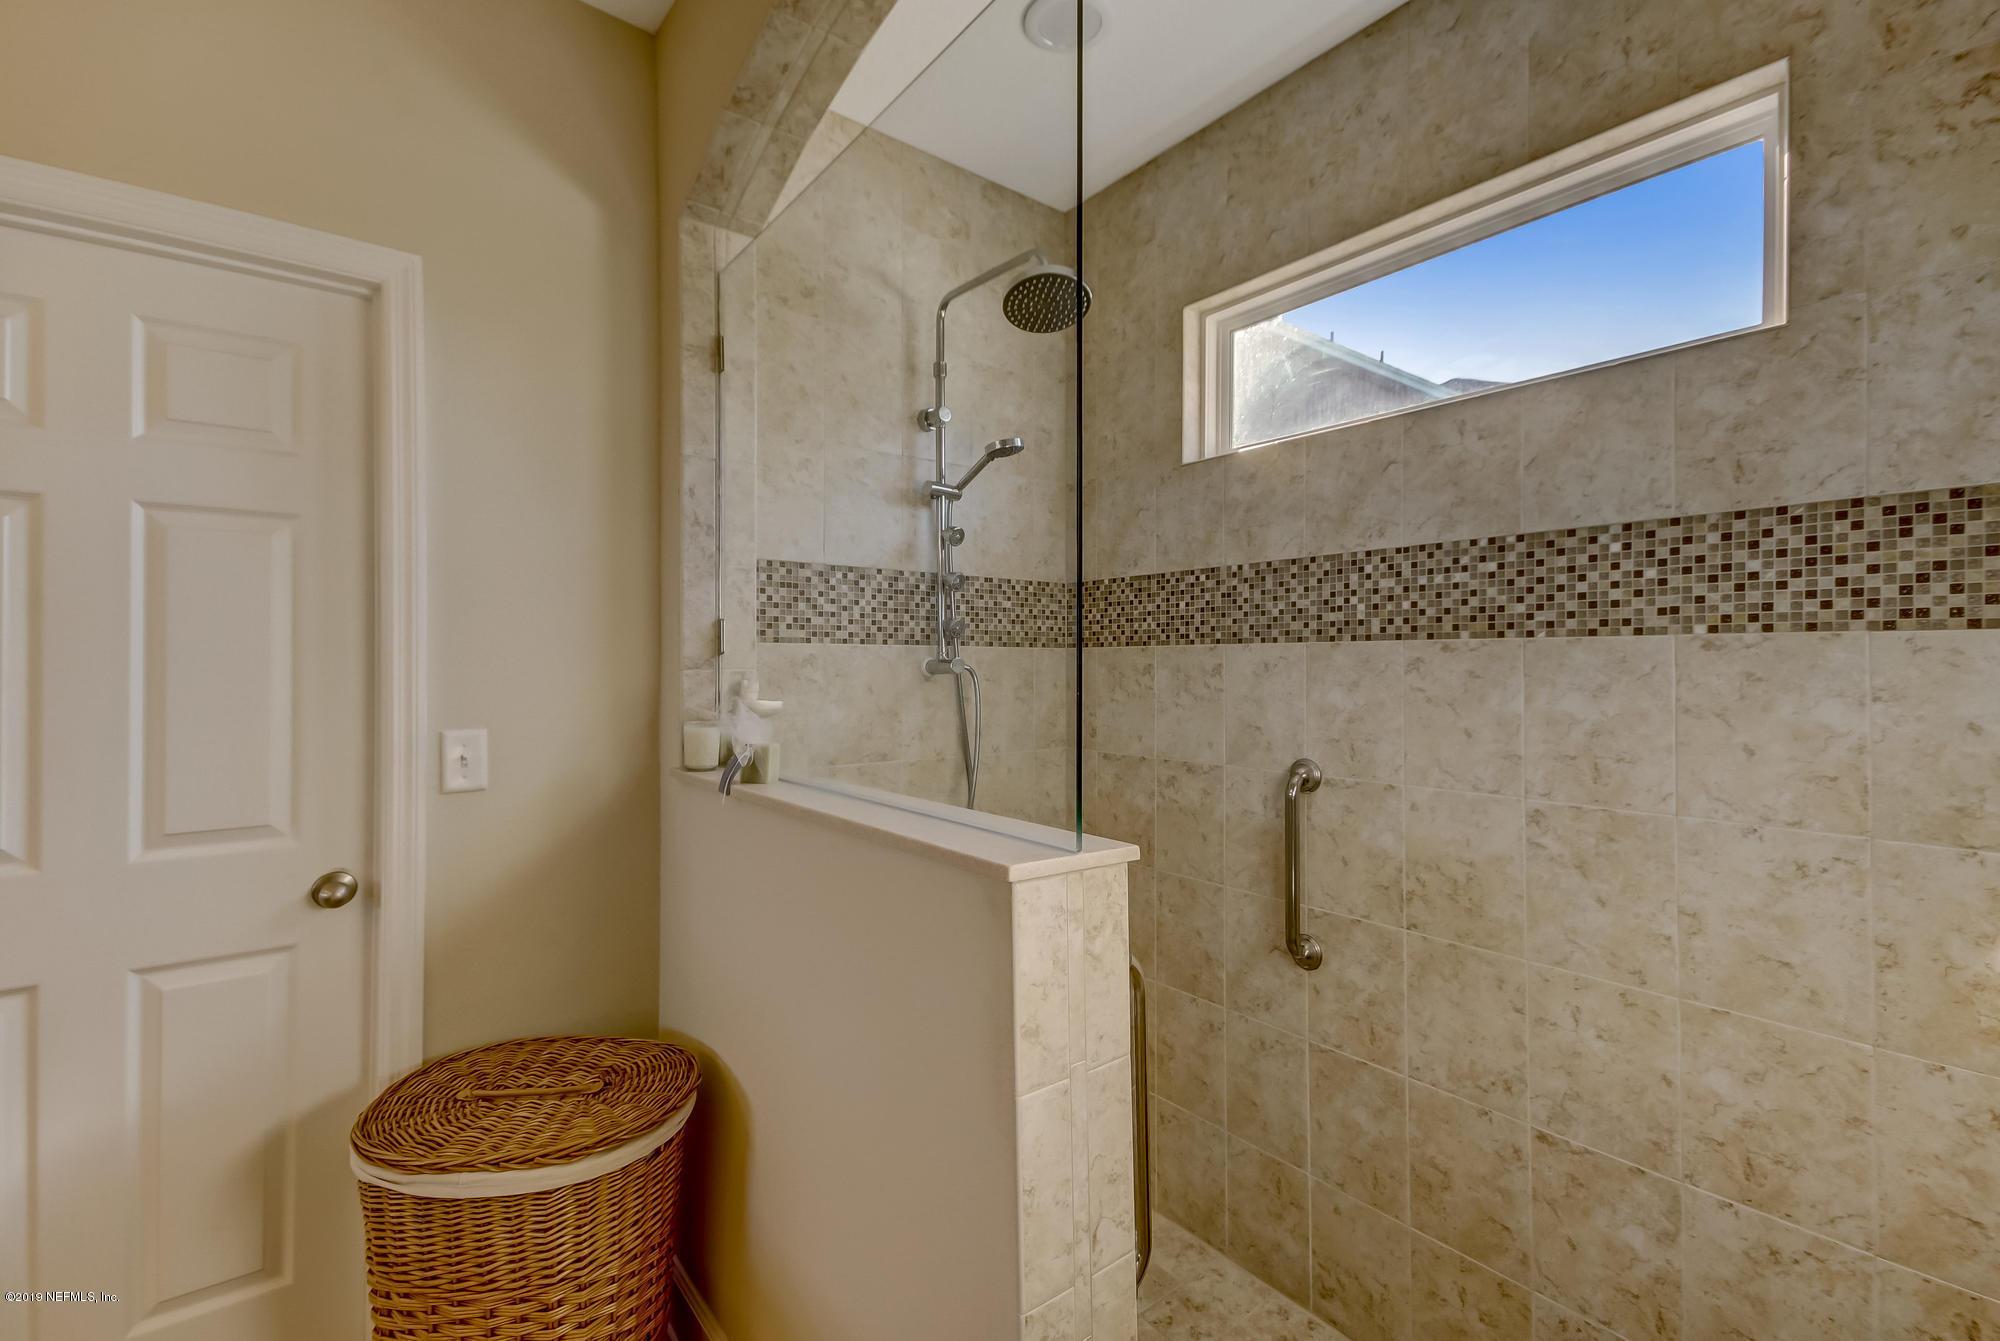 368 CAMERON, PONTE VEDRA, FLORIDA 32081, 3 Bedrooms Bedrooms, ,2 BathroomsBathrooms,Residential - single family,For sale,CAMERON,993190